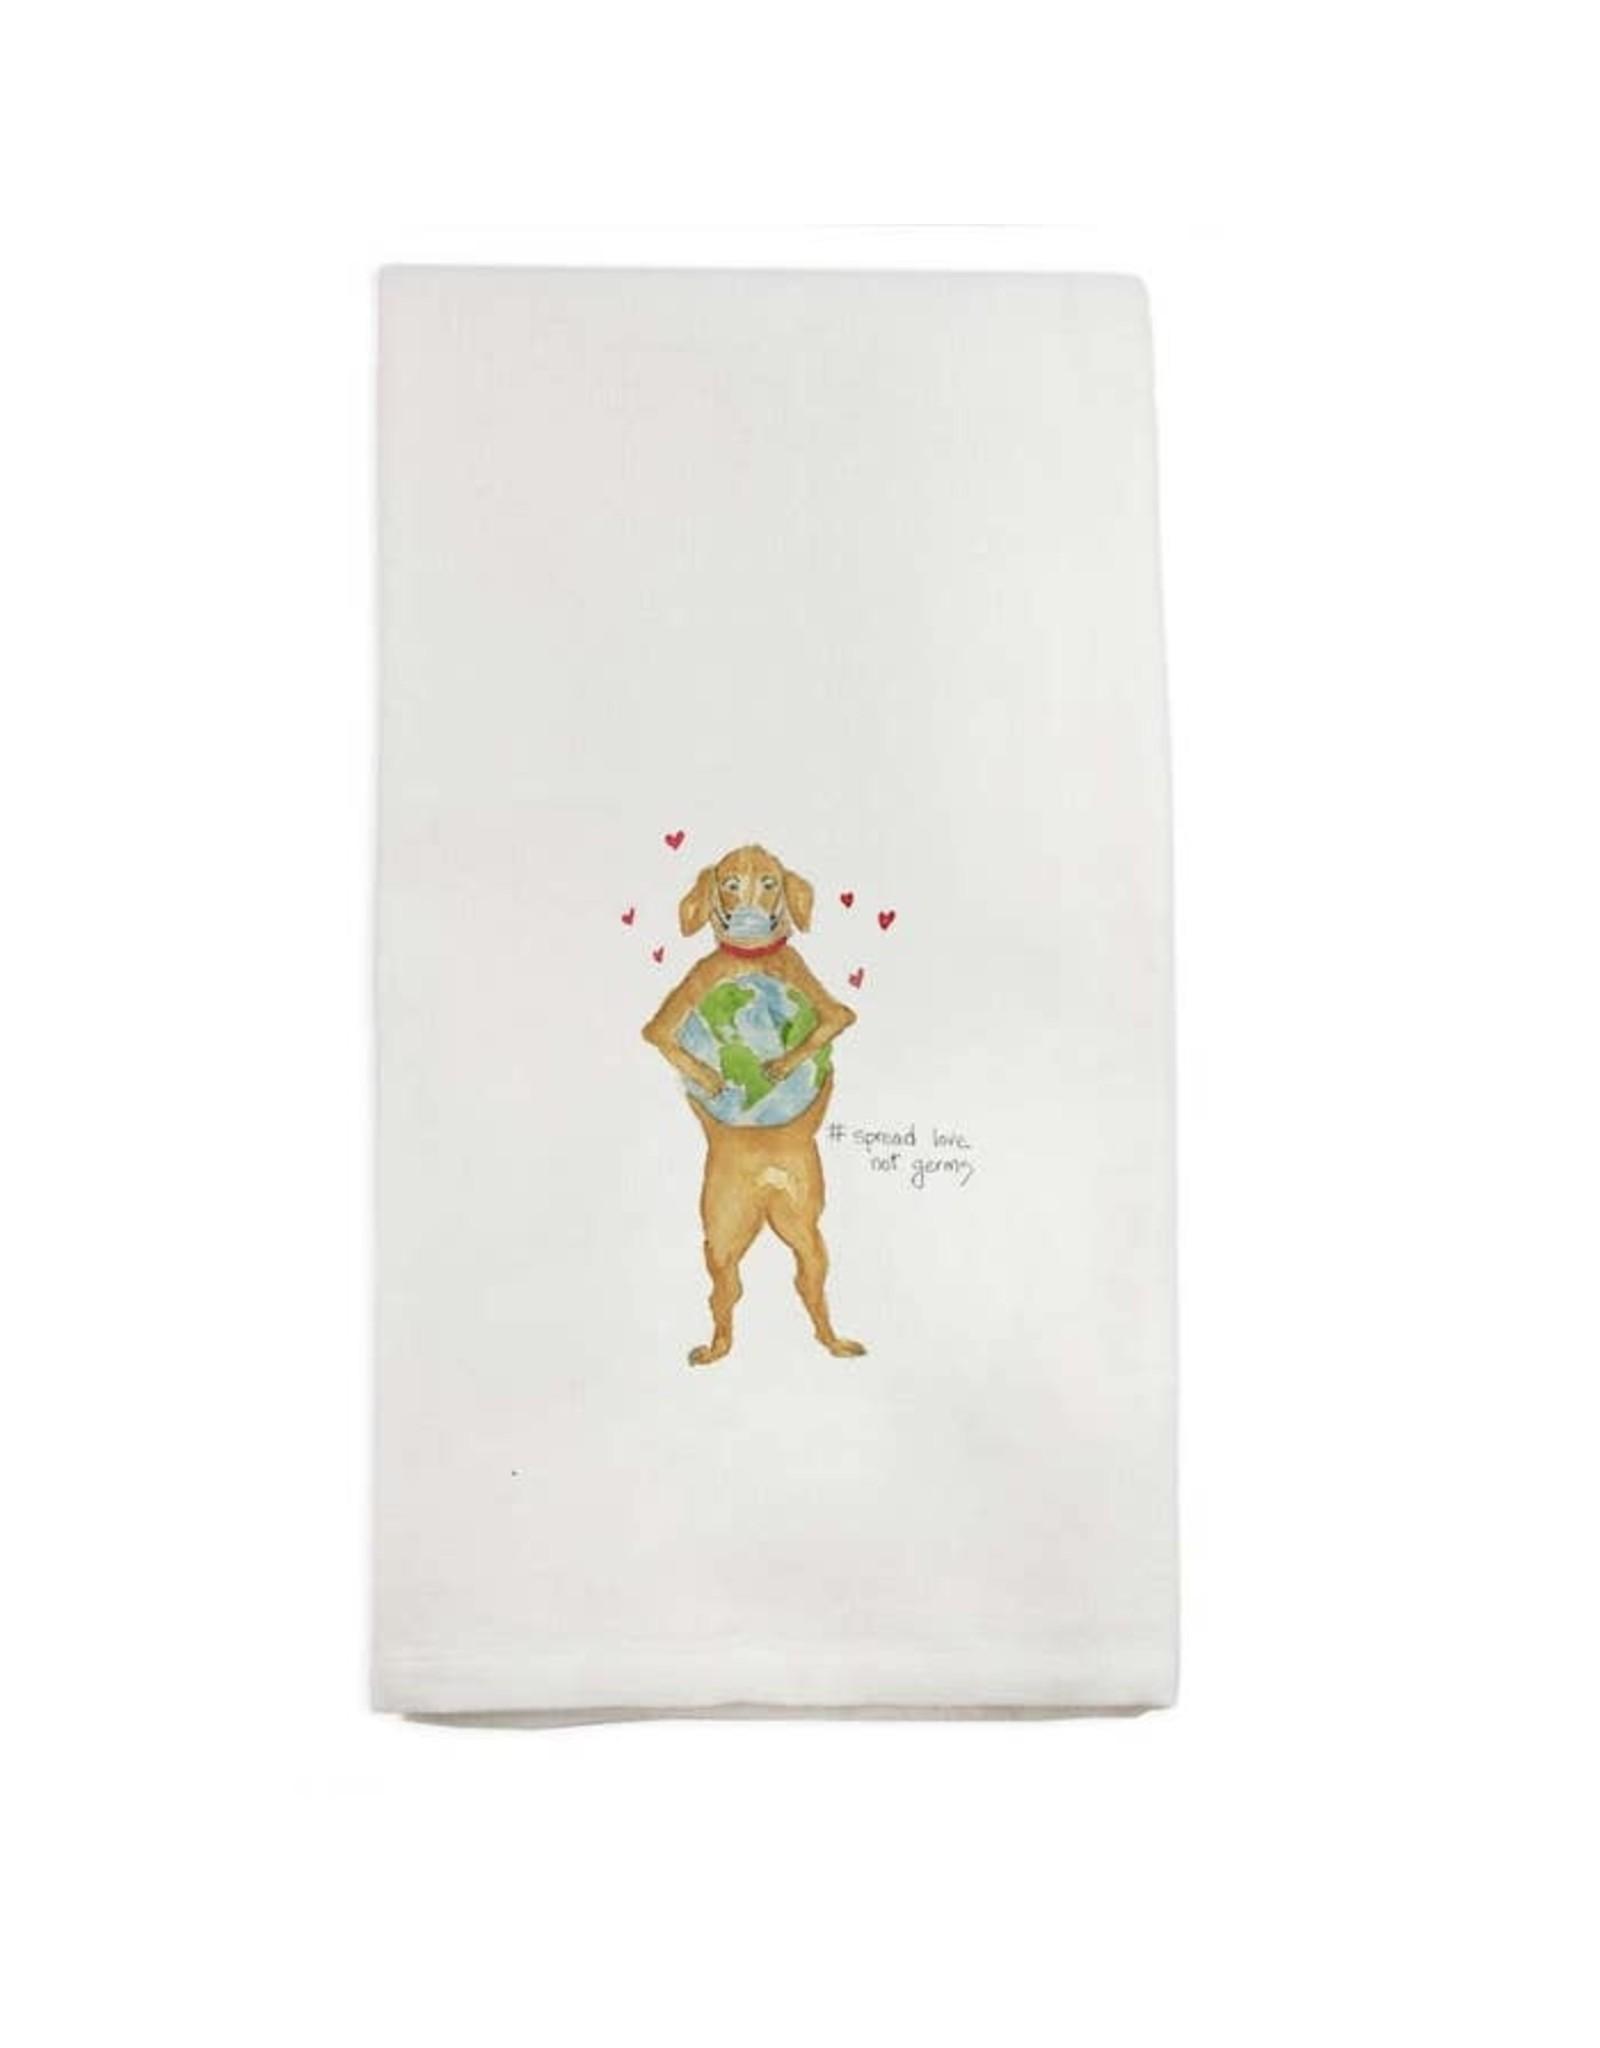 Pomp & Prose Spread Love Not Germs Tea Towel PPT